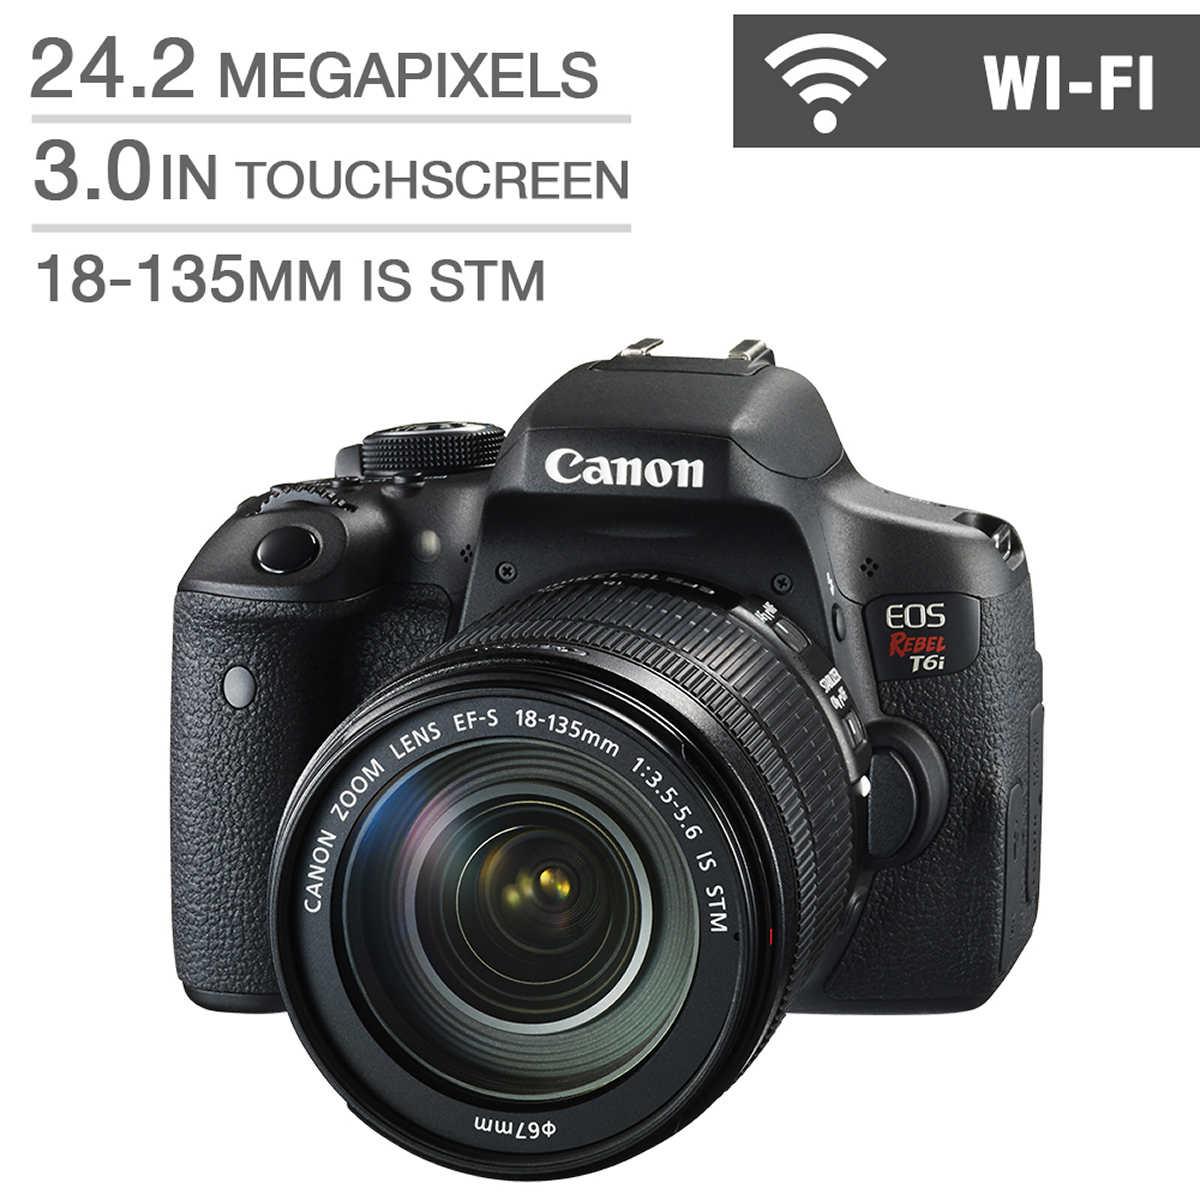 DSLR Cameras   Costco